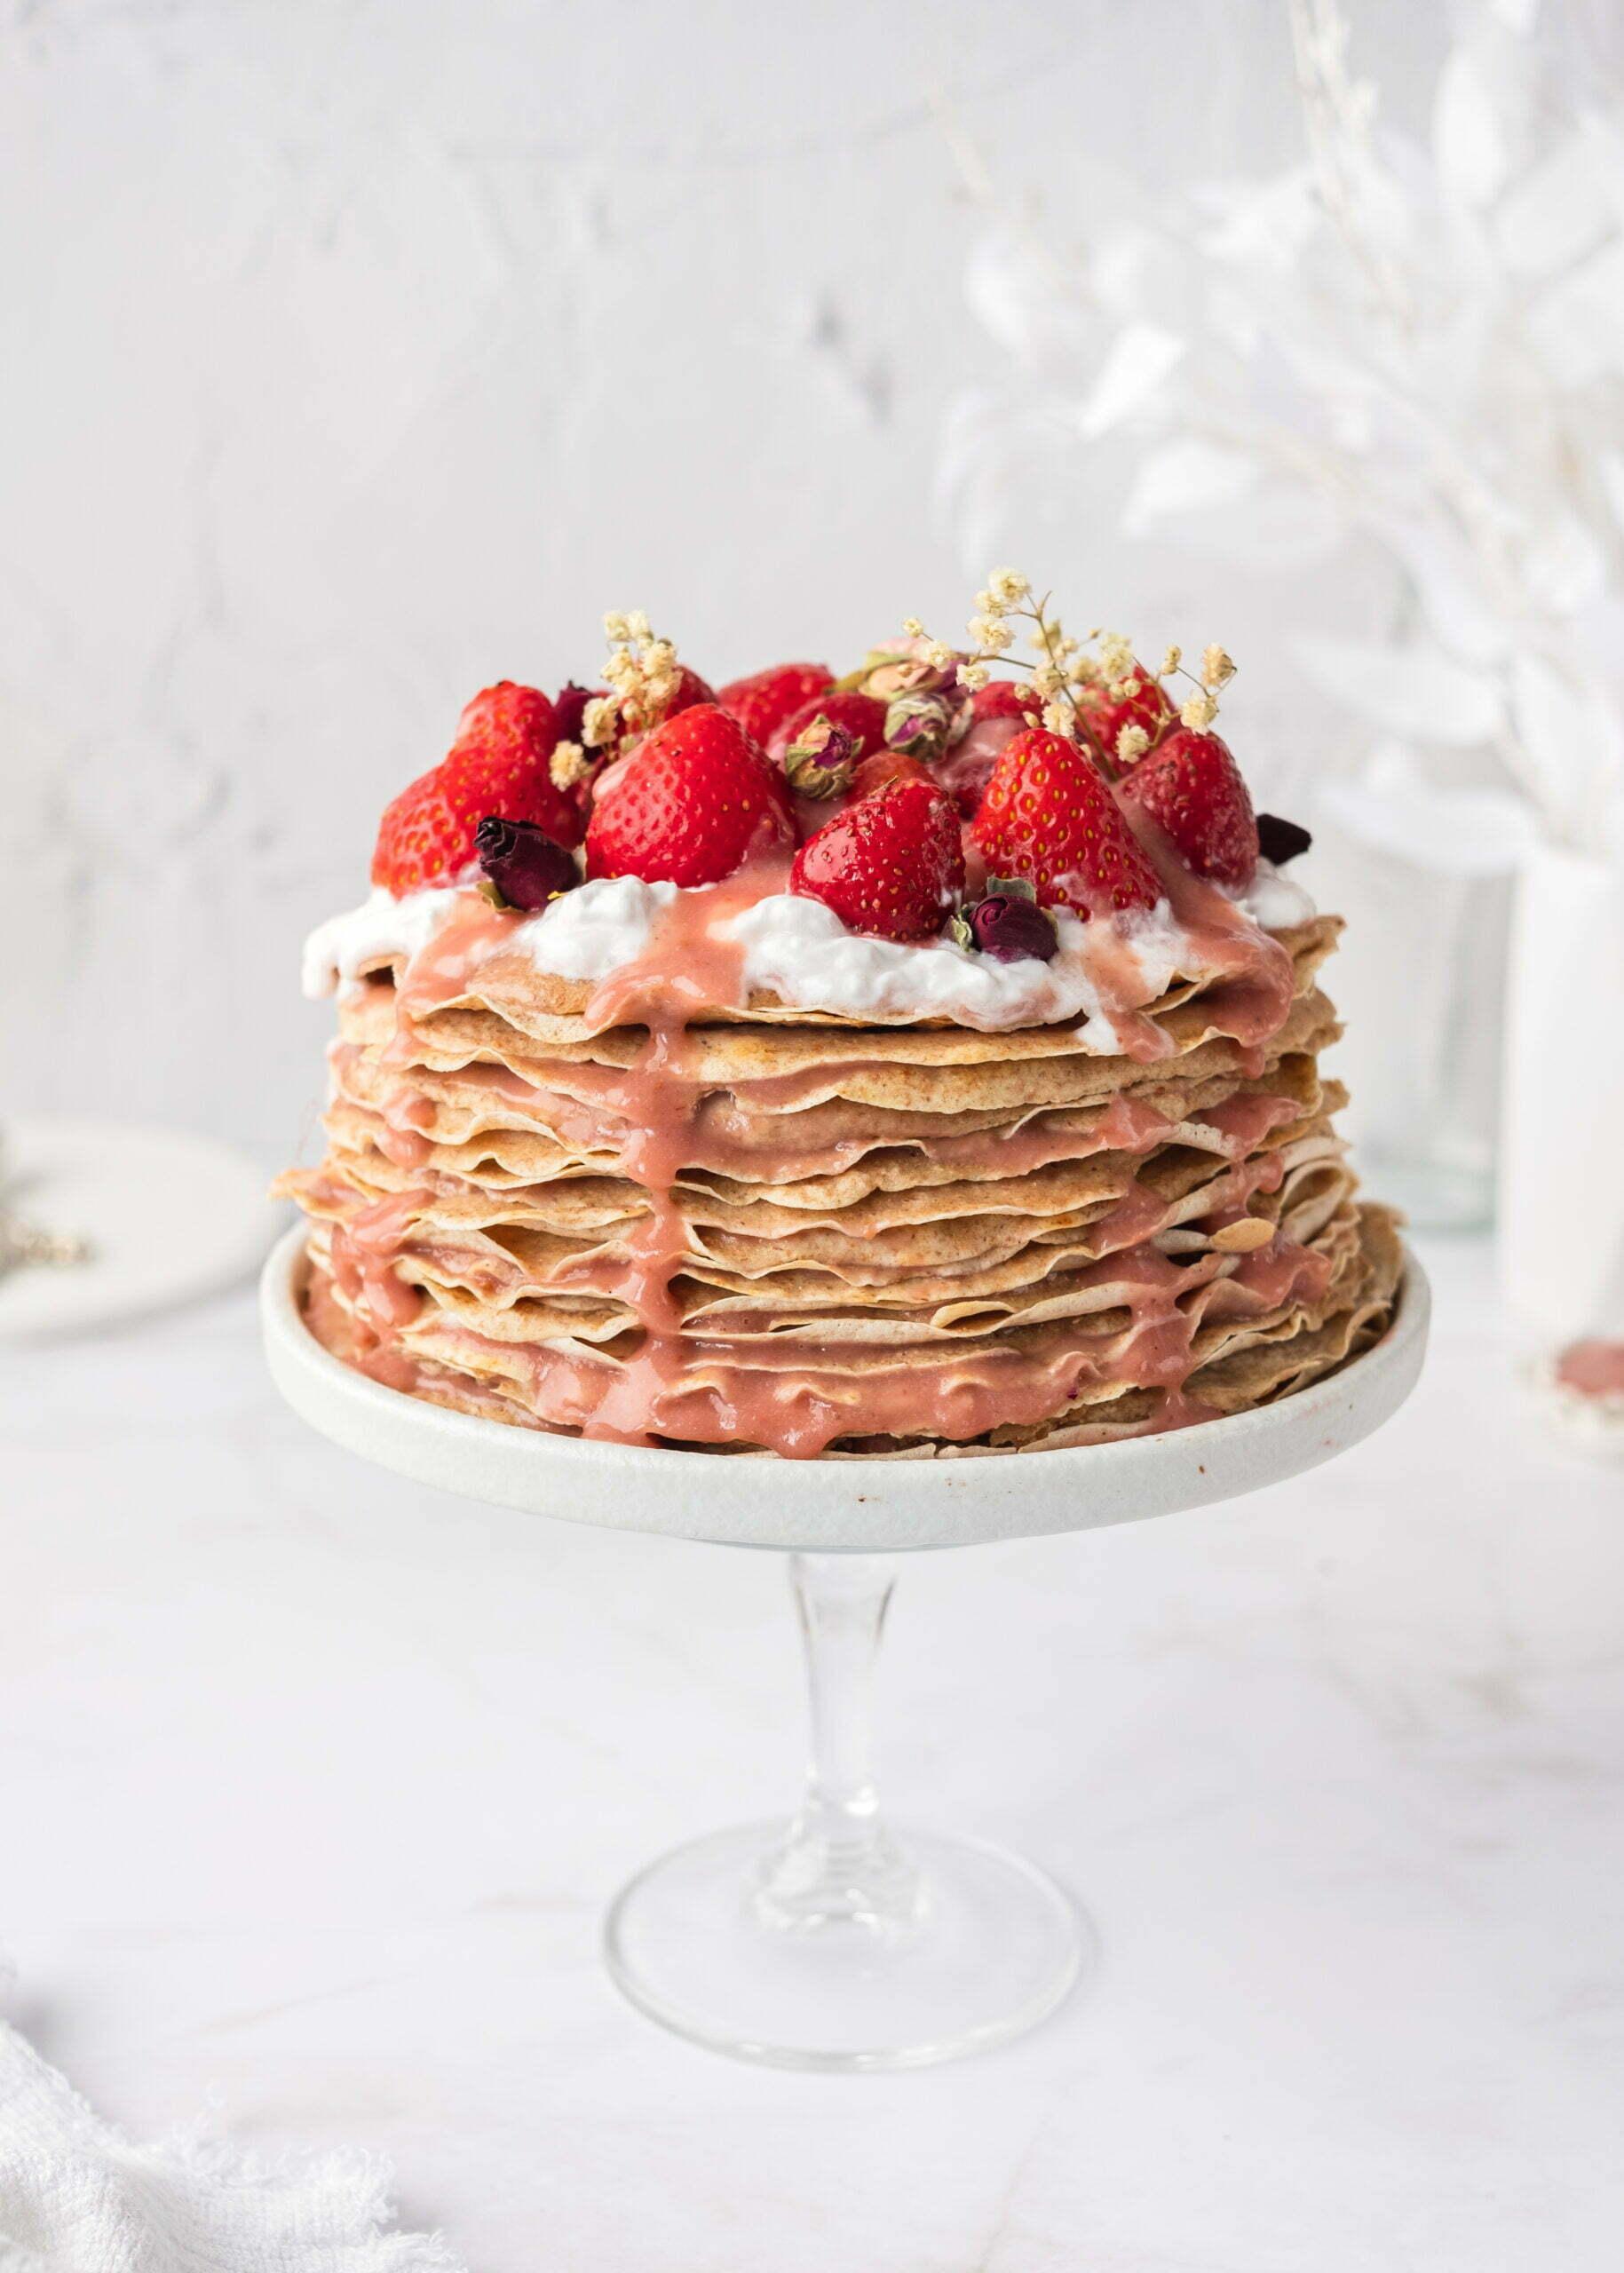 Torta iz polnozrnatih palačink